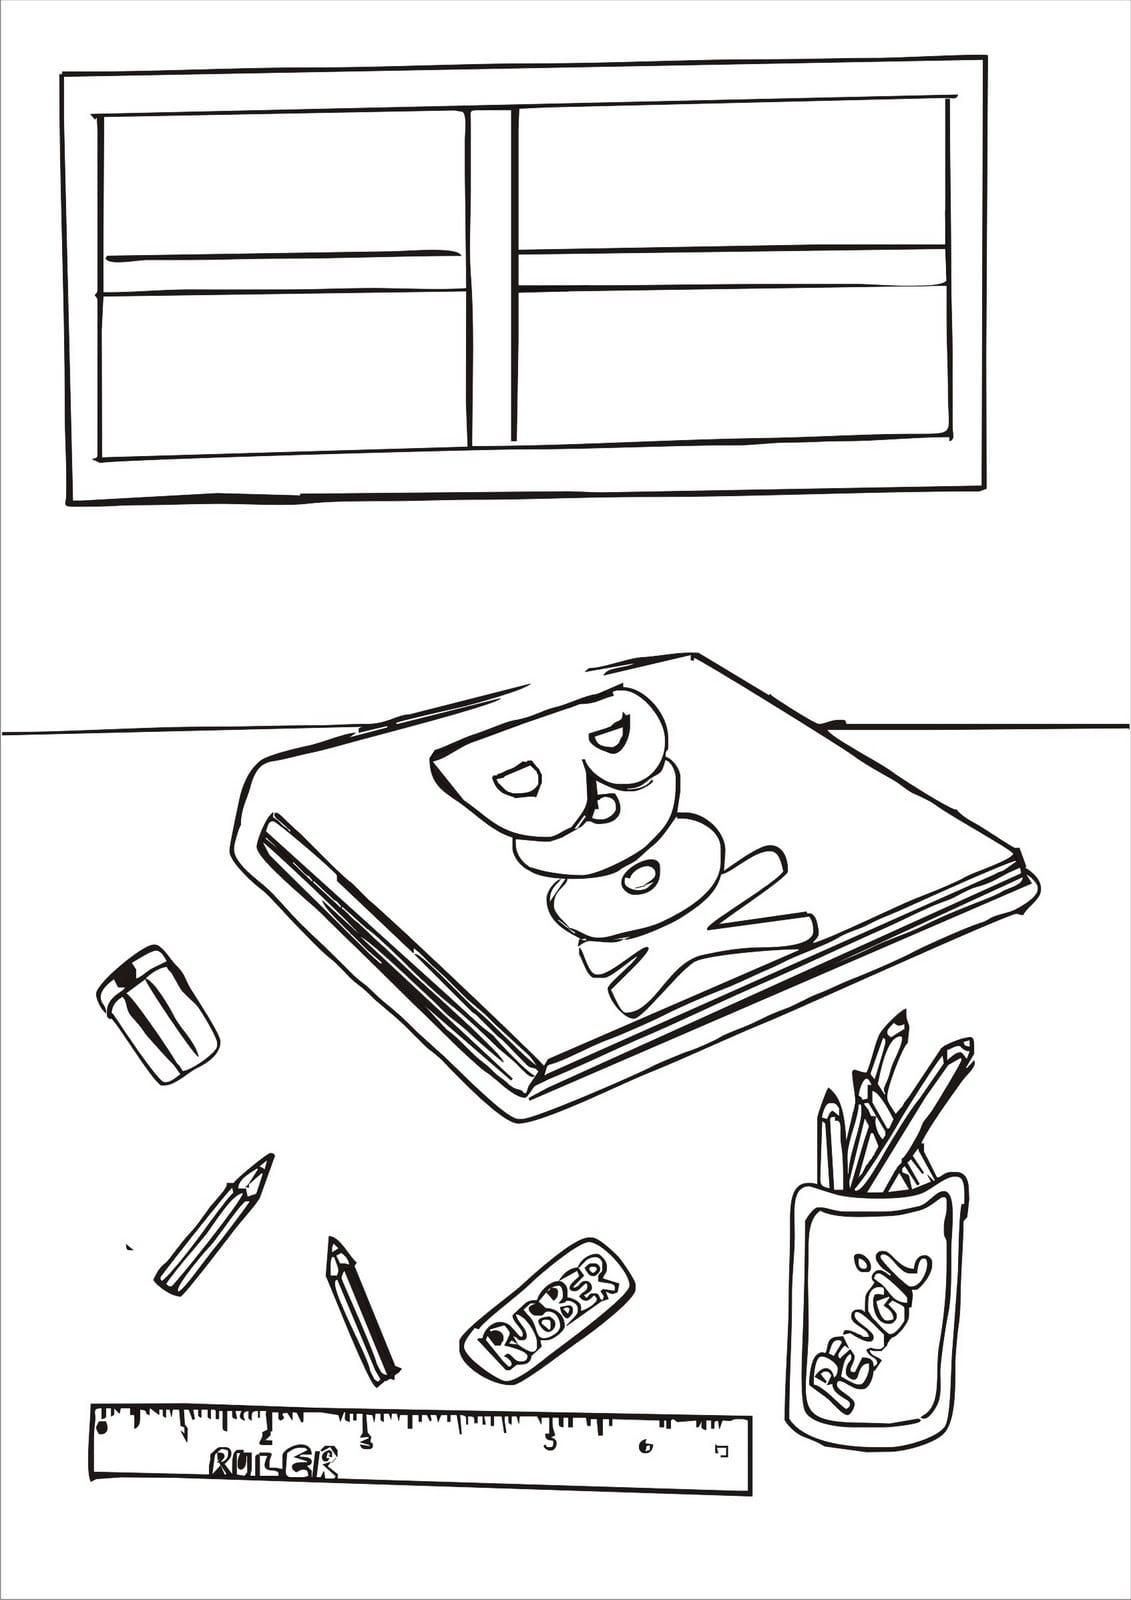 Desenhos De Material Escolar Para Colorir E Pintar